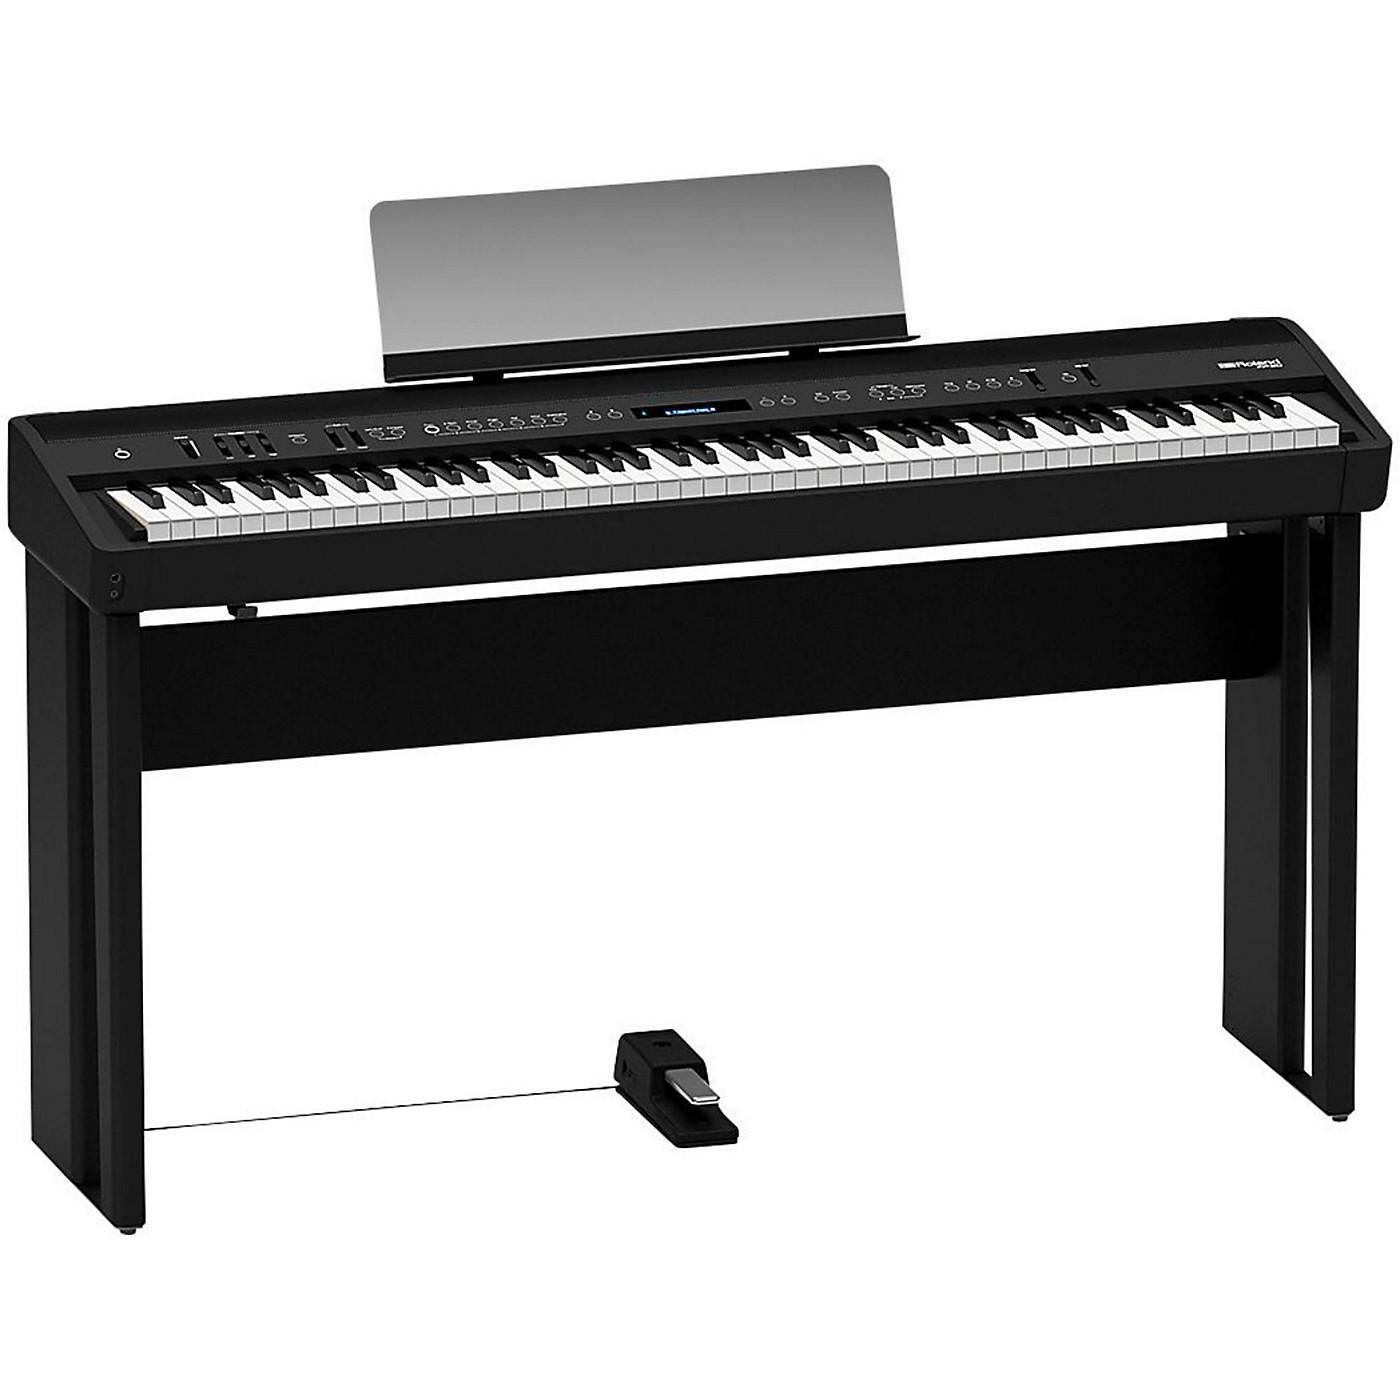 Roland KSC-90-BK Digital Piano Stand for FP-90-BK thumbnail